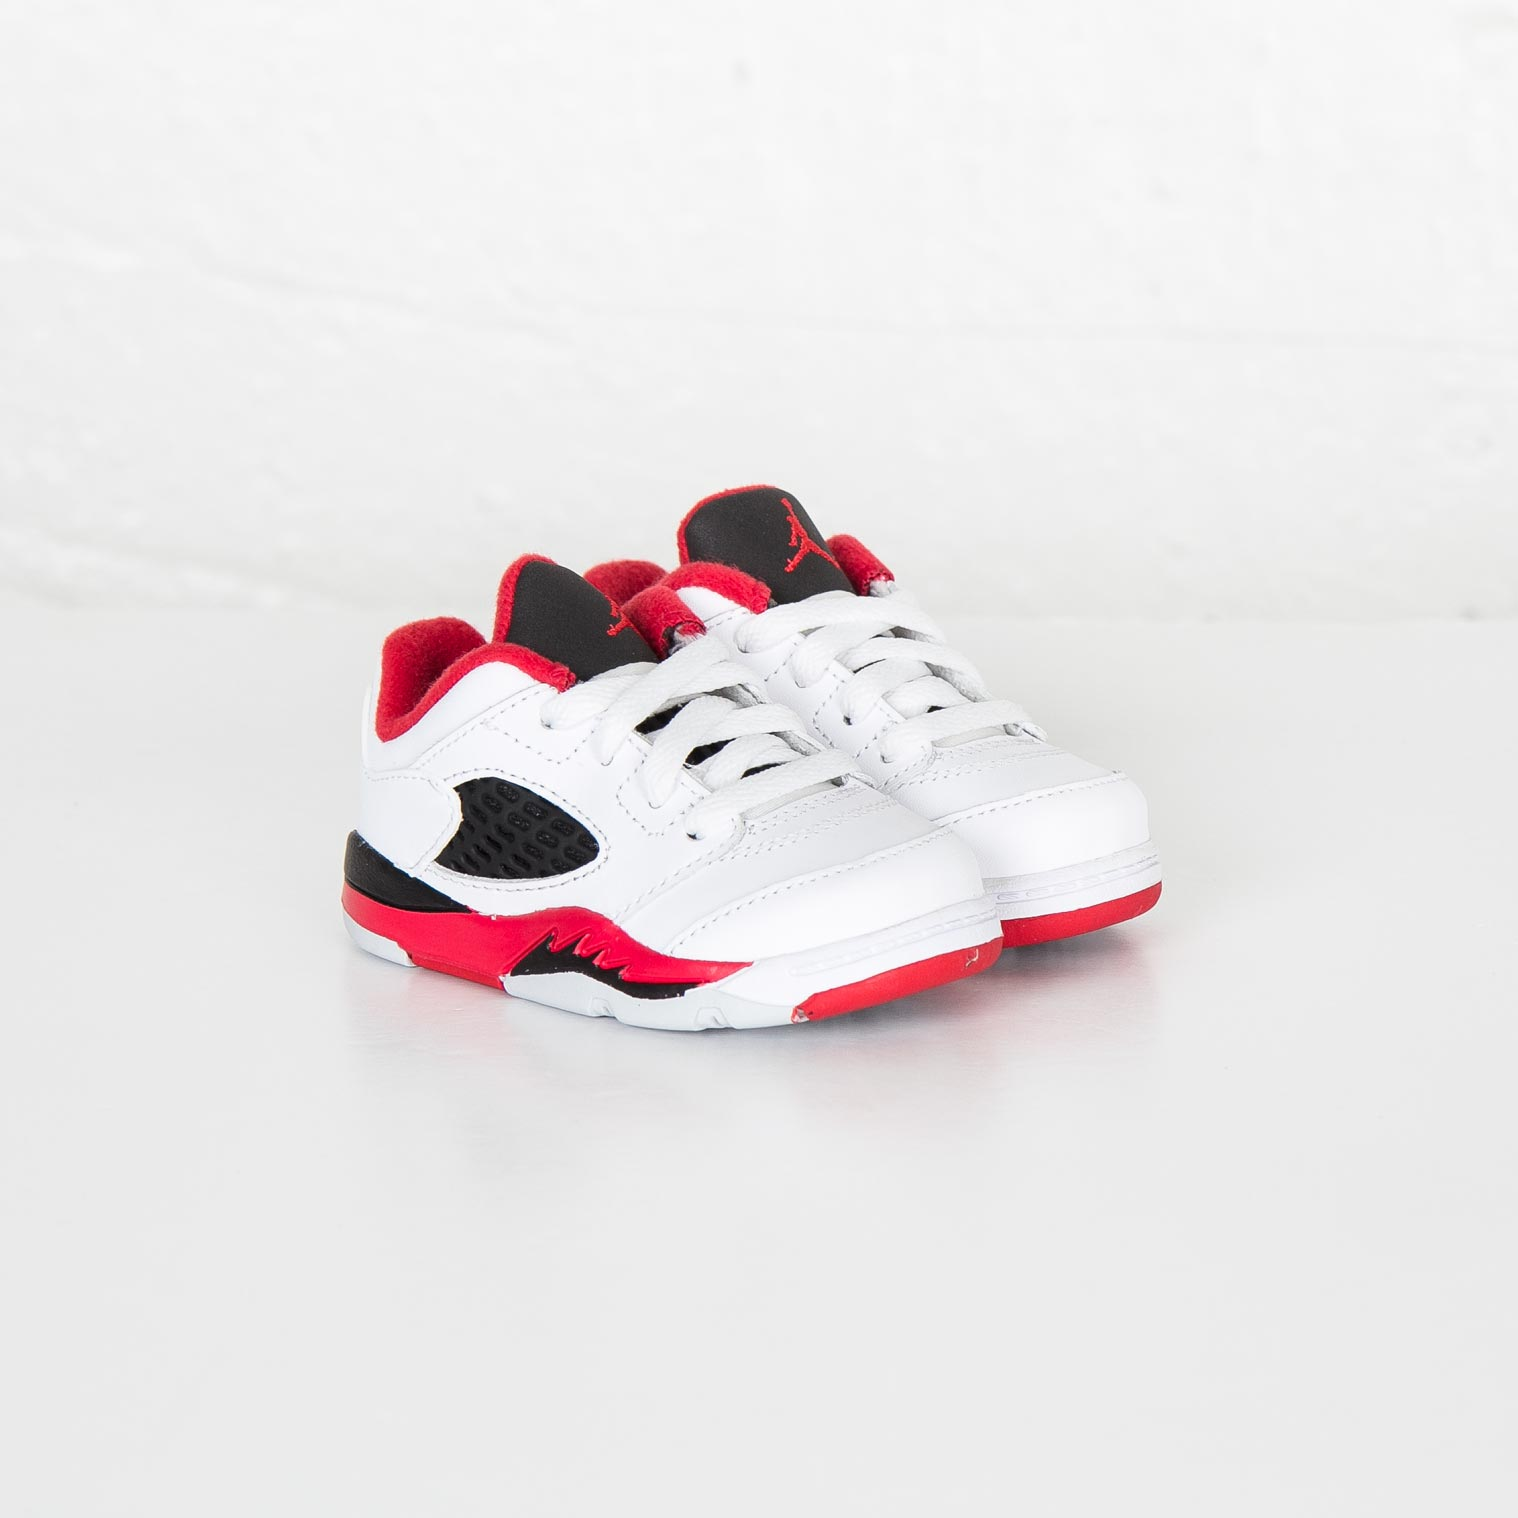 Jordan Brand Air Jordan 5 Retro Low (TD) - 314340-101 ... aafac90c4